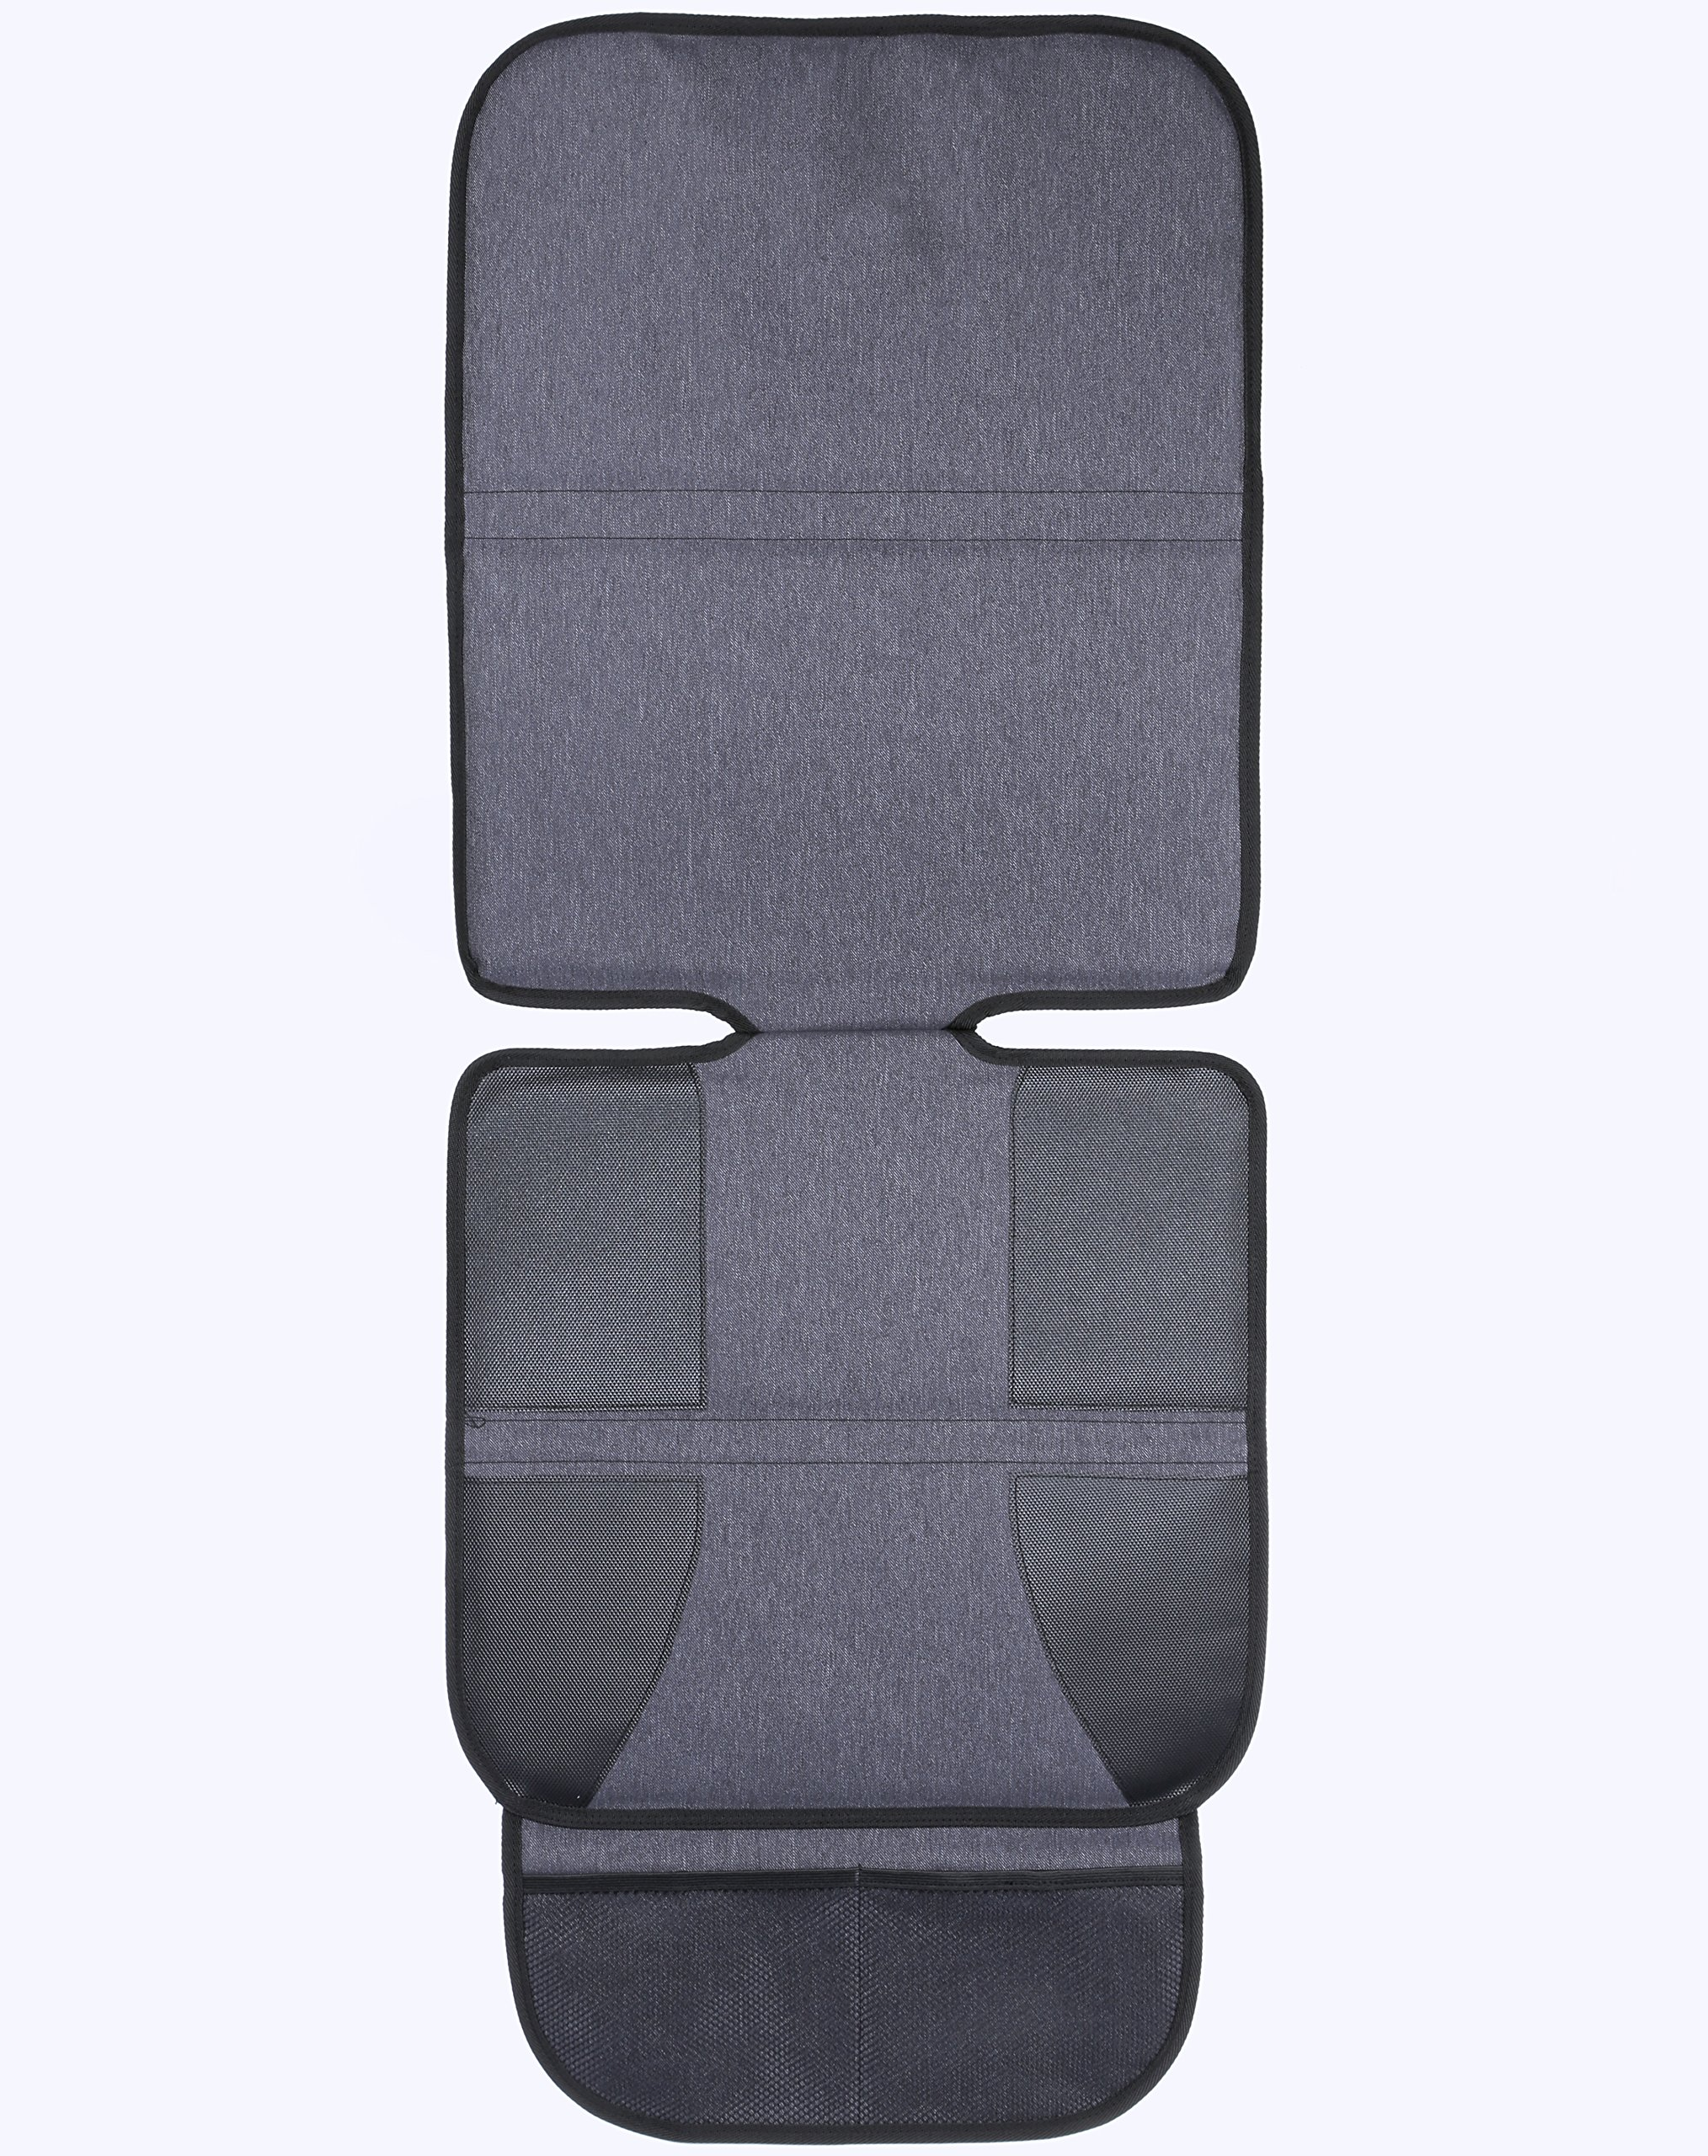 Amazon.com : Evenflo Maestro Booster Car Seat, Taylor : Baby